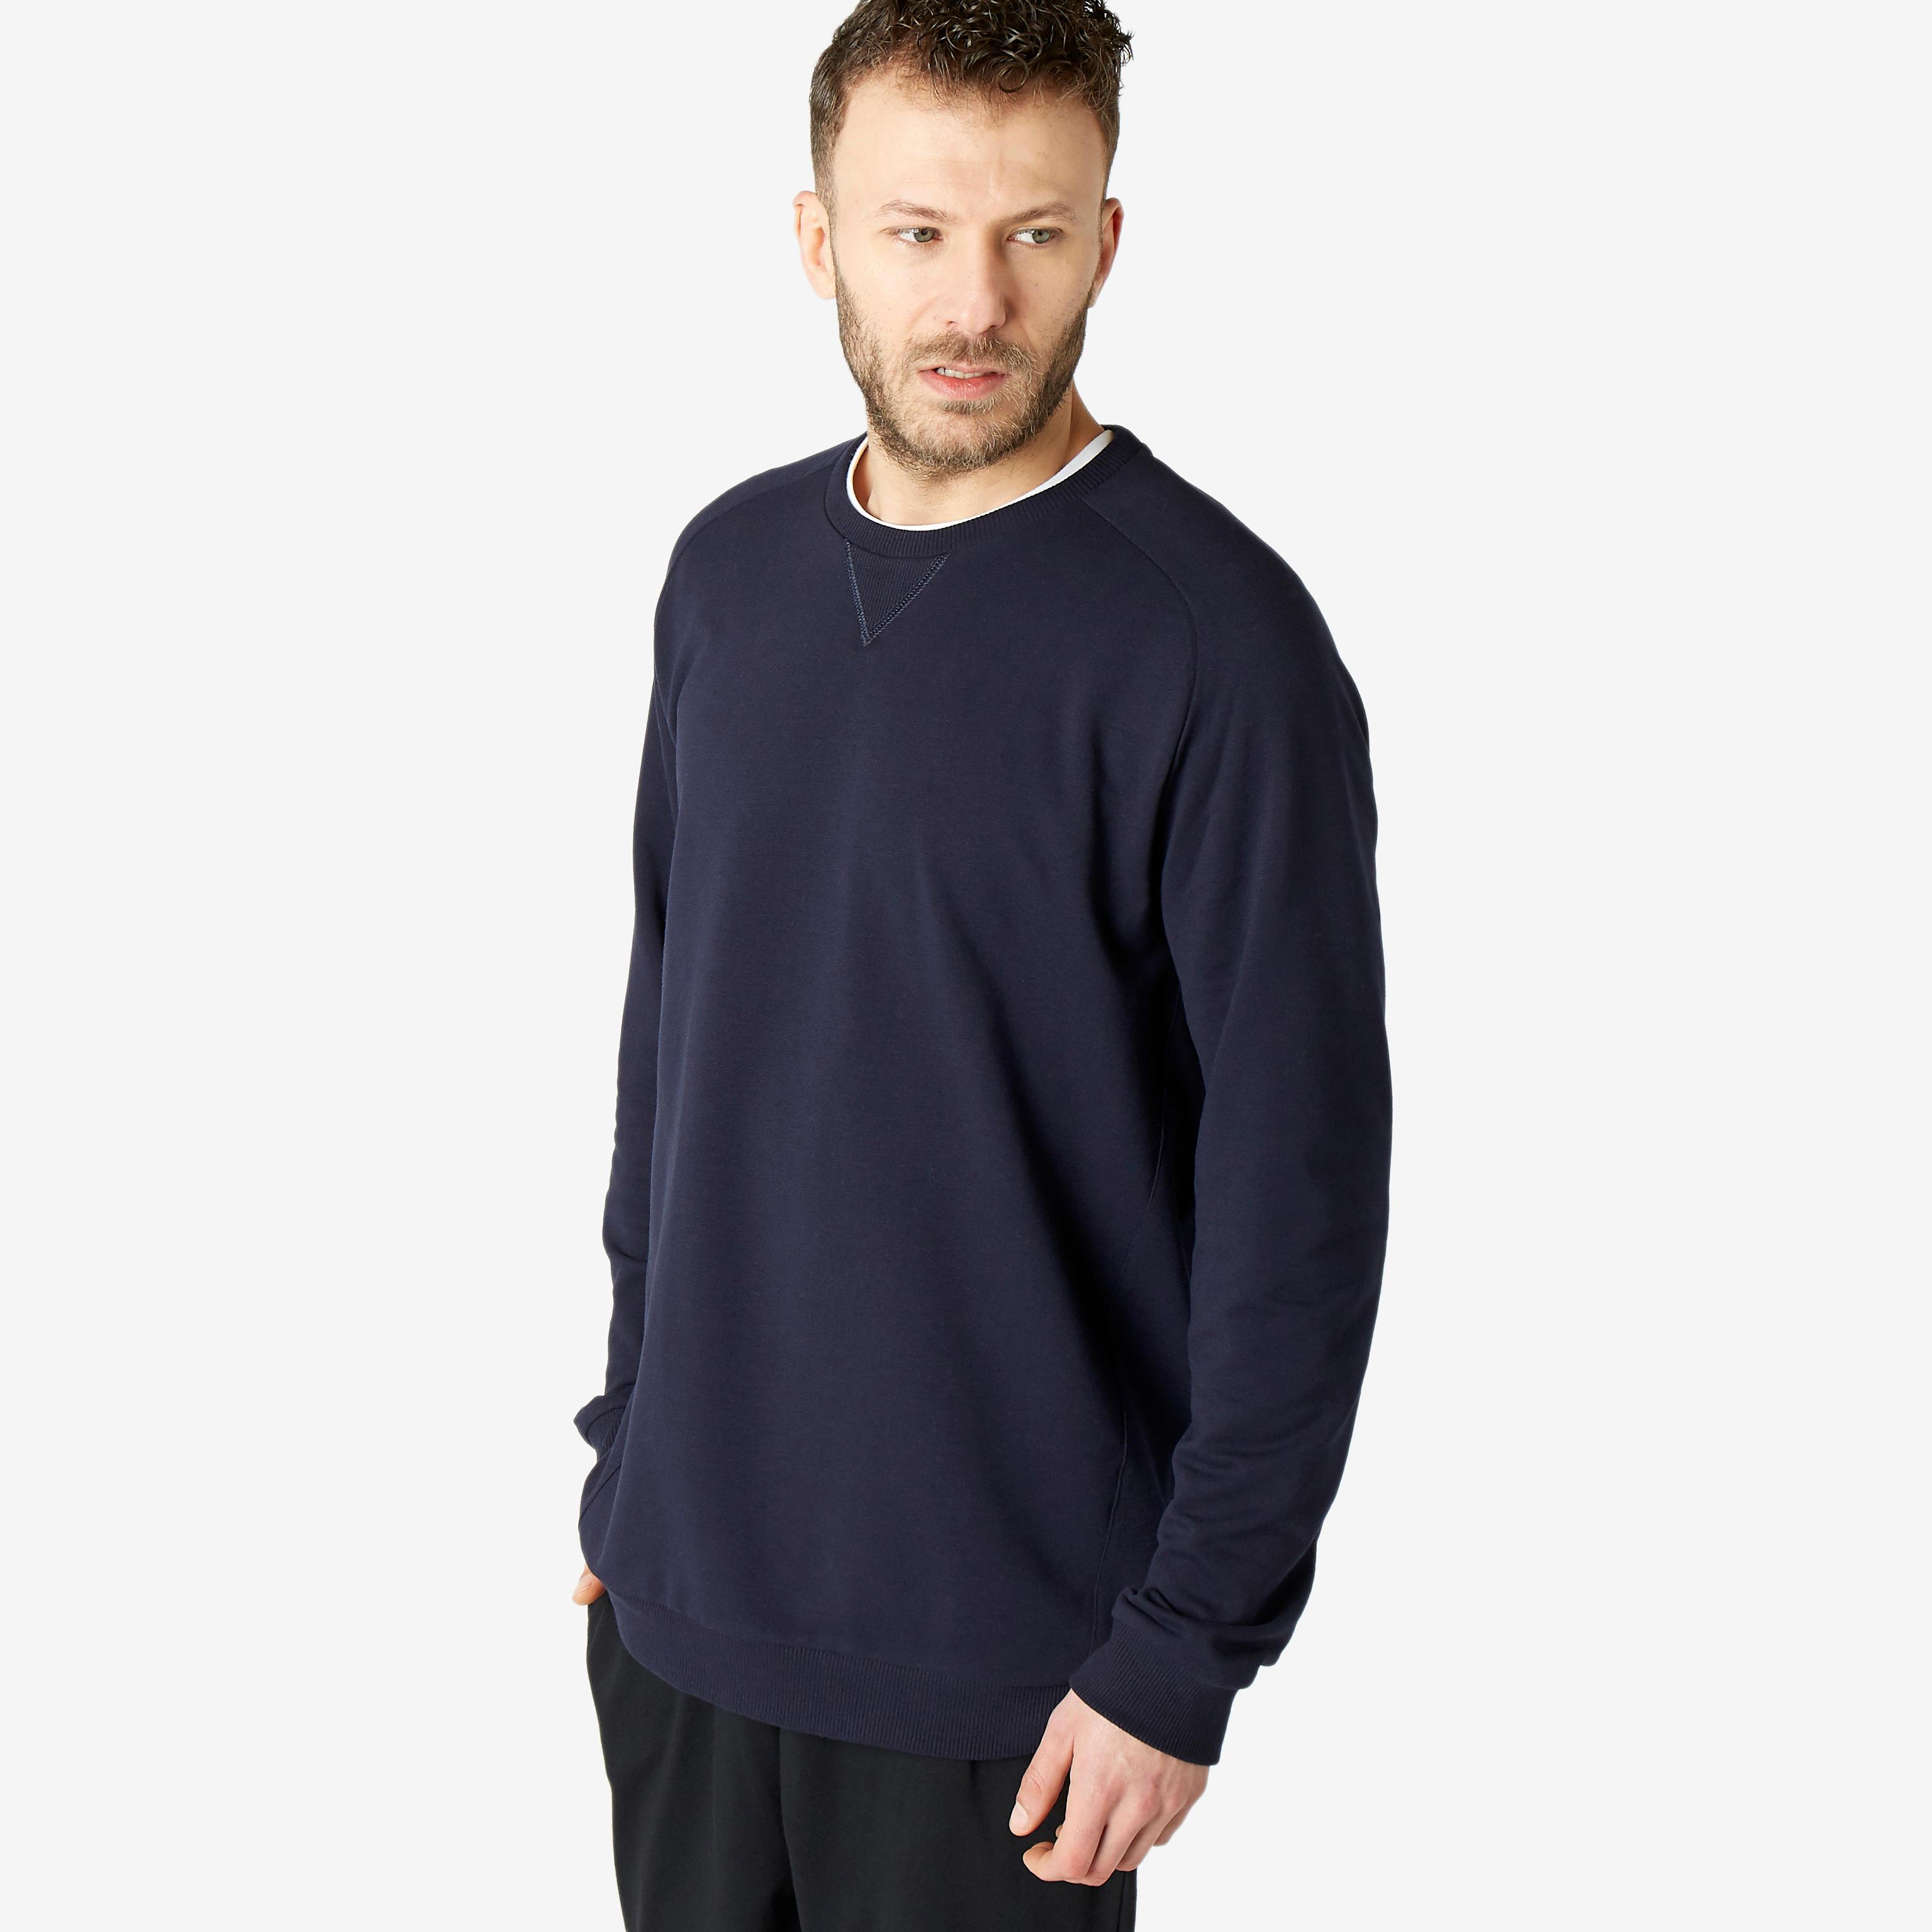 Bluză Fitness 100 Bărbați imagine